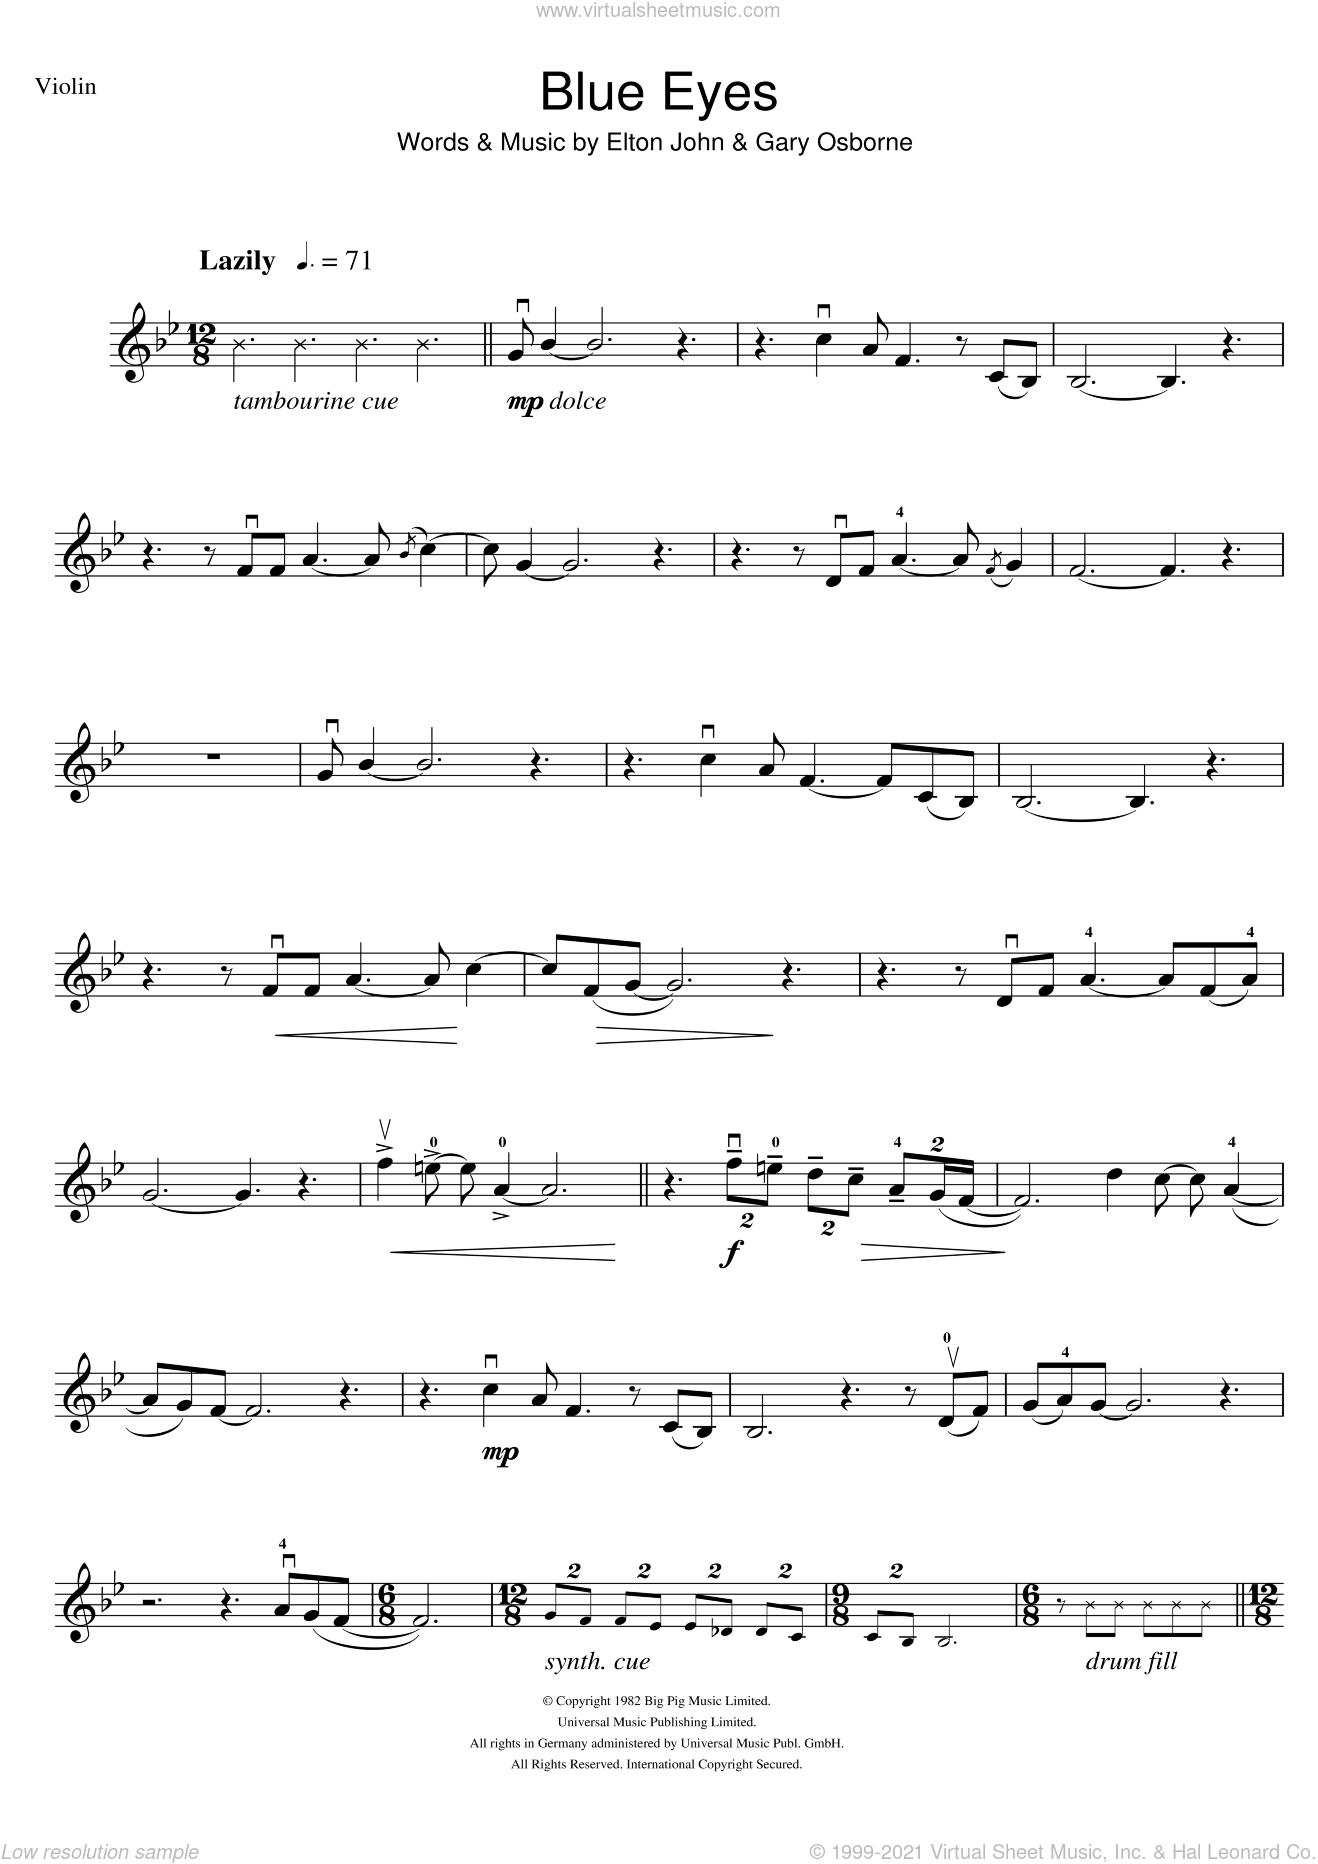 Blue Eyes sheet music for violin solo by Elton John and Gary Osborne, intermediate skill level